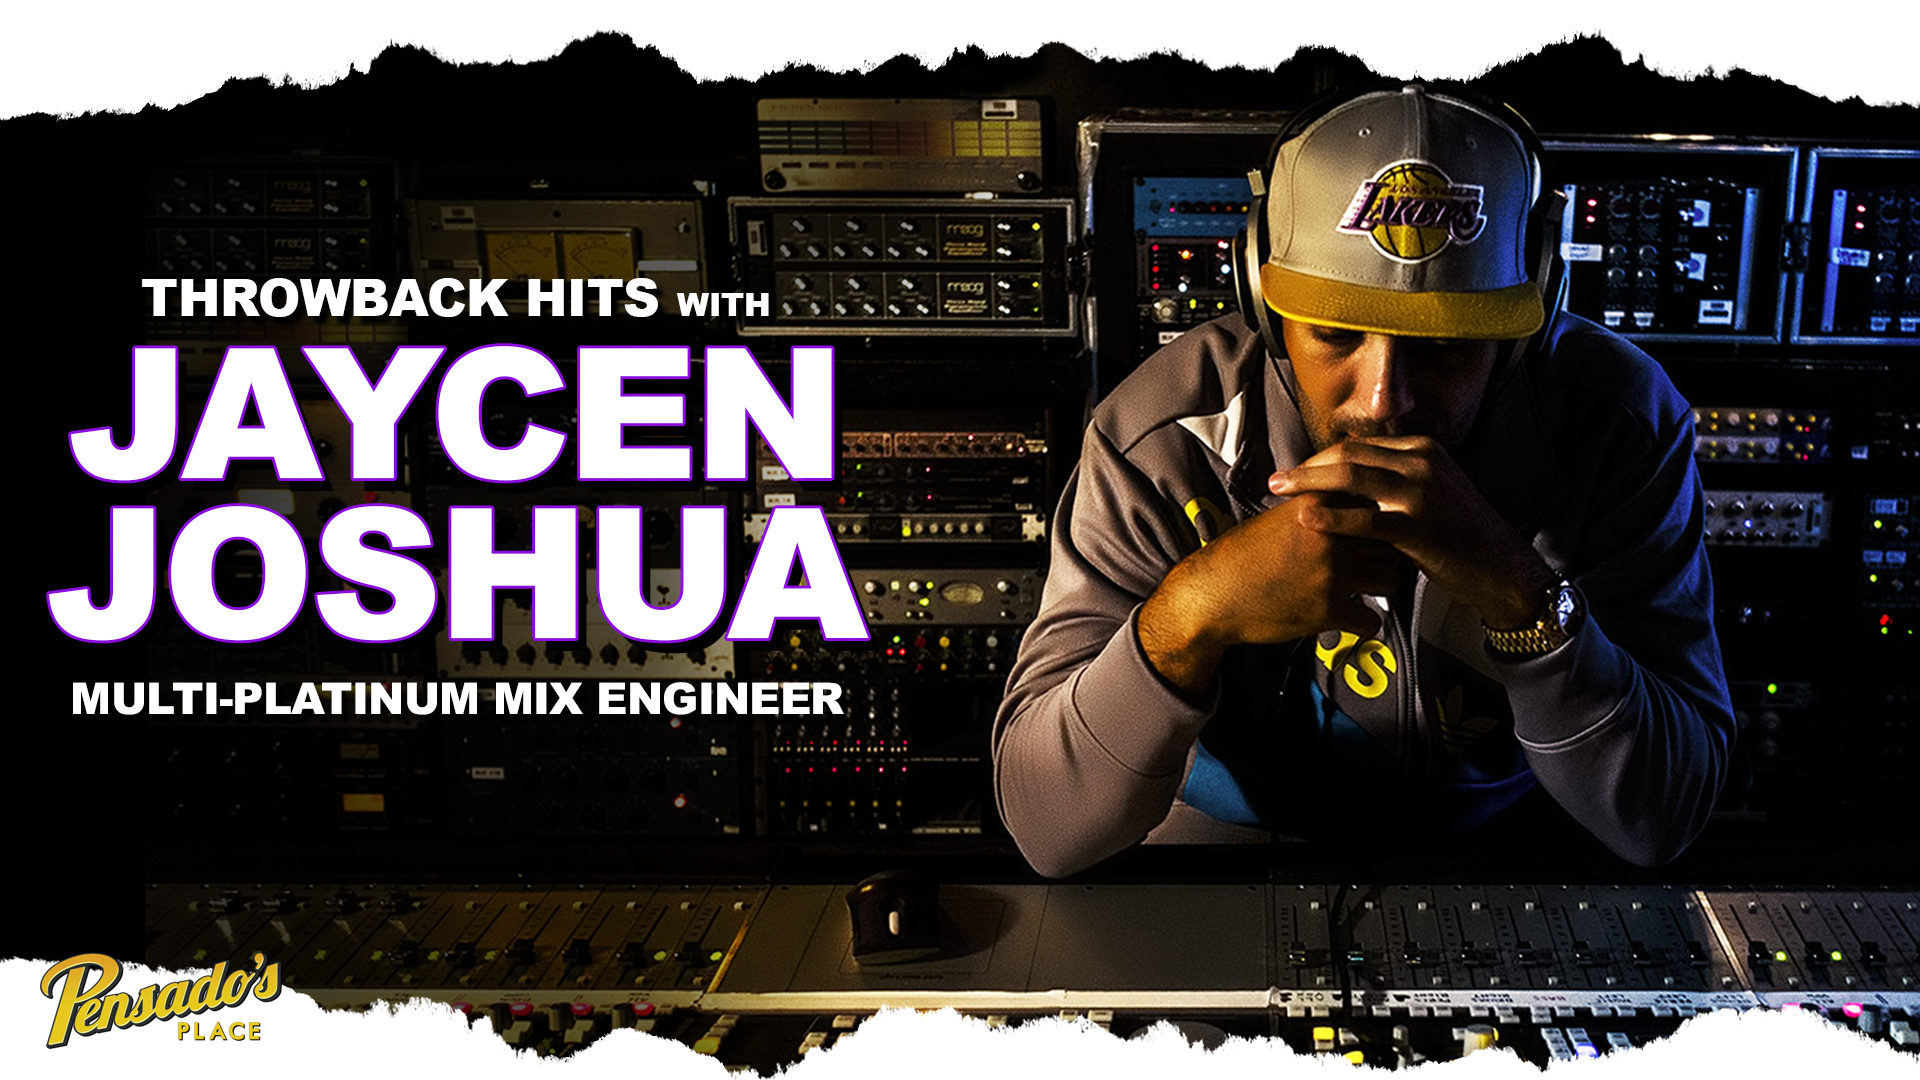 Throwback Hits with Multi-Platinum Mix Engineer, Jaycen Joshua